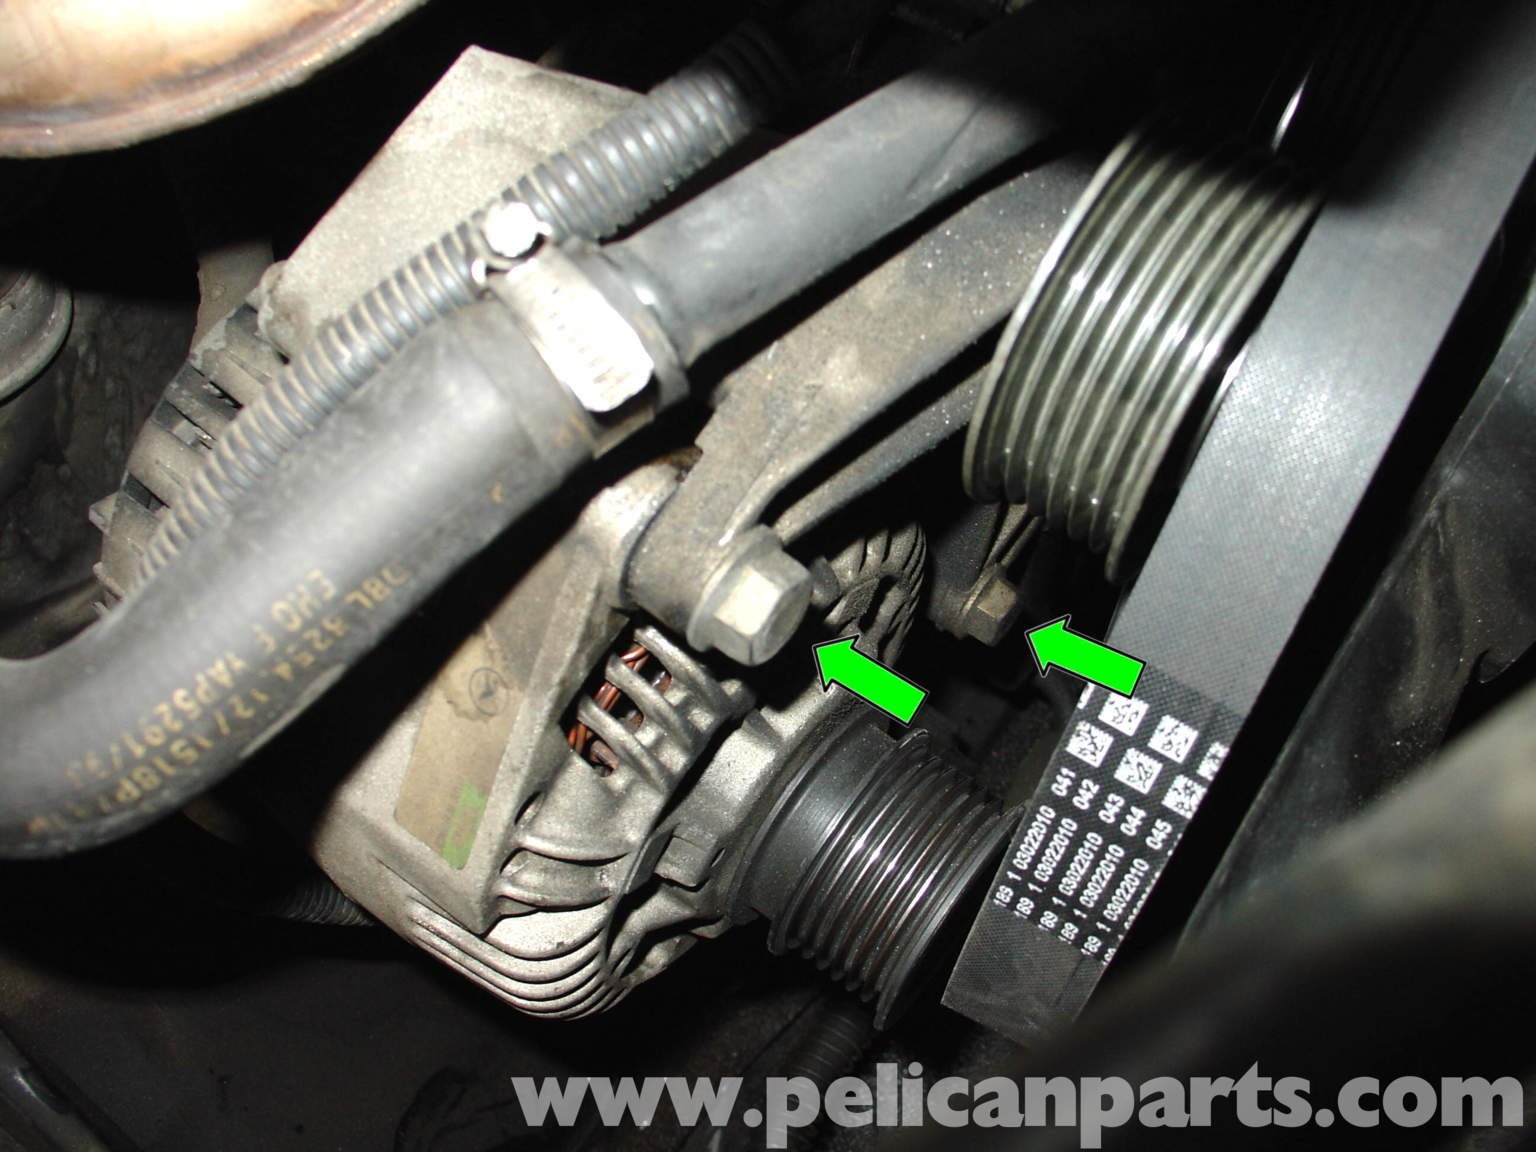 Mercedes benz w210 alternator replacement 1996 03 e320 for Mercedes benz alternator repair cost